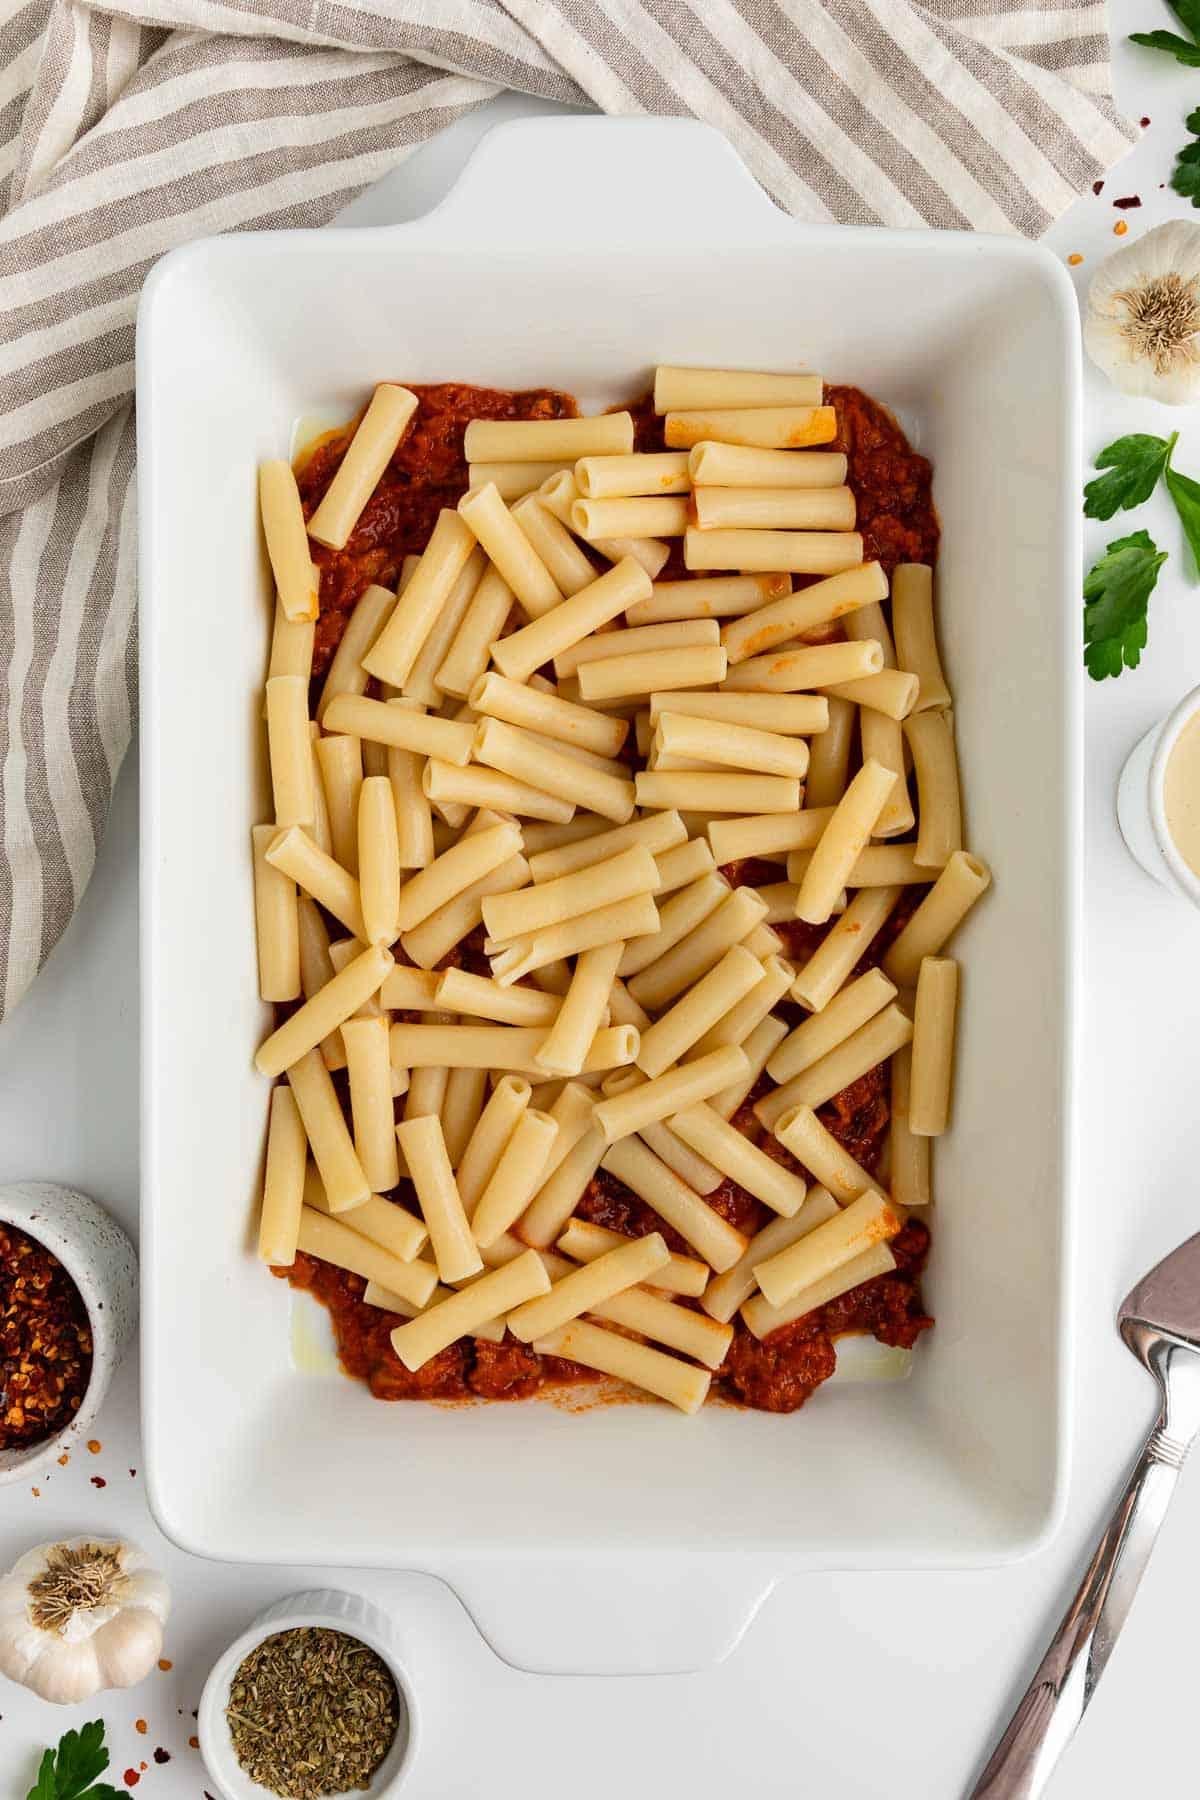 a white casserole dish with marinara sauce and ziti pasta in it